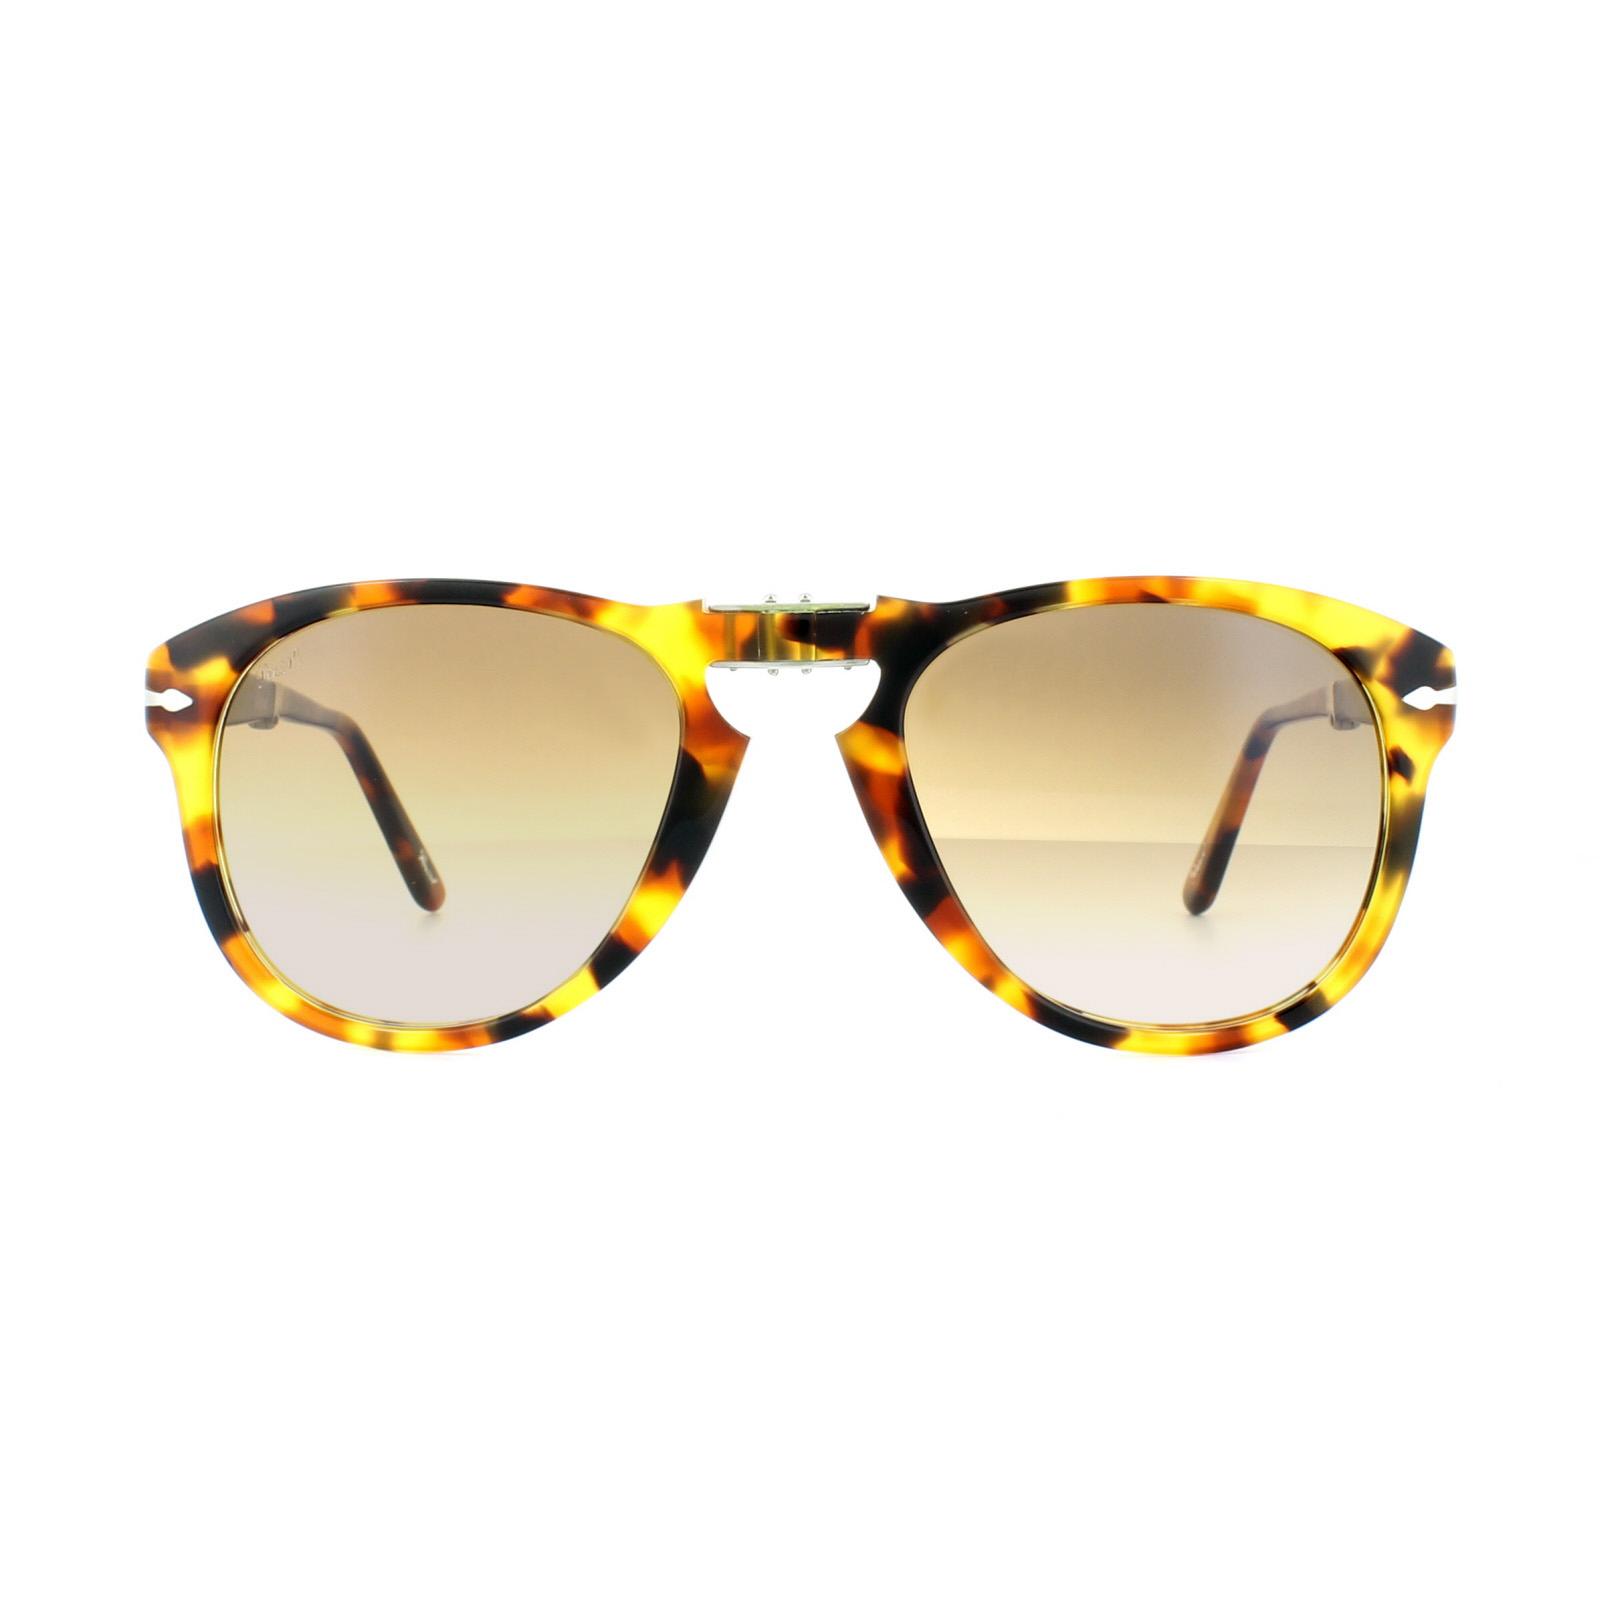 d7cc4556f7 Sentinel Persol Sunglasses 0714 105251 Madreterra Brown Gradient